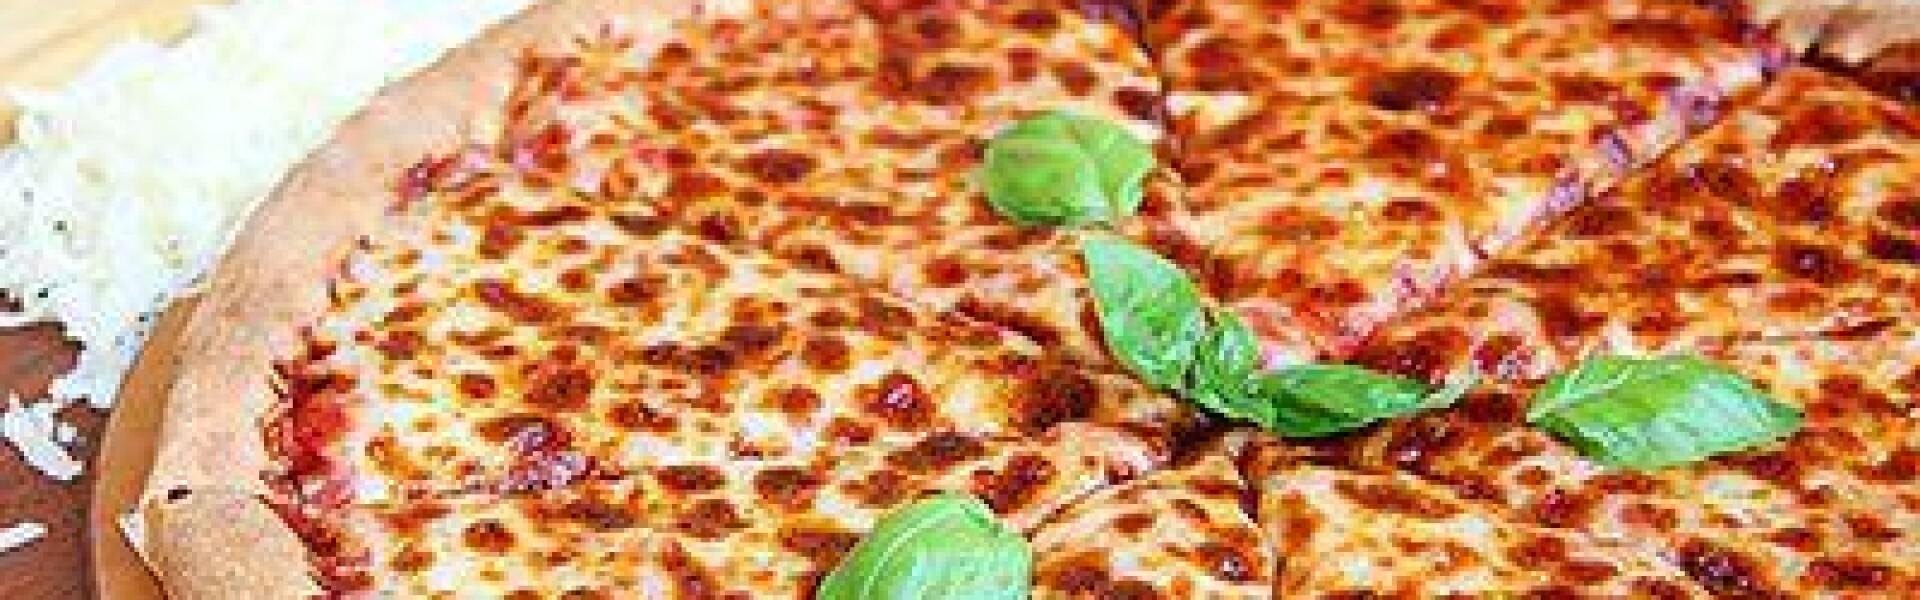 CoolWNS ·Мастер-класс итальянской кухни